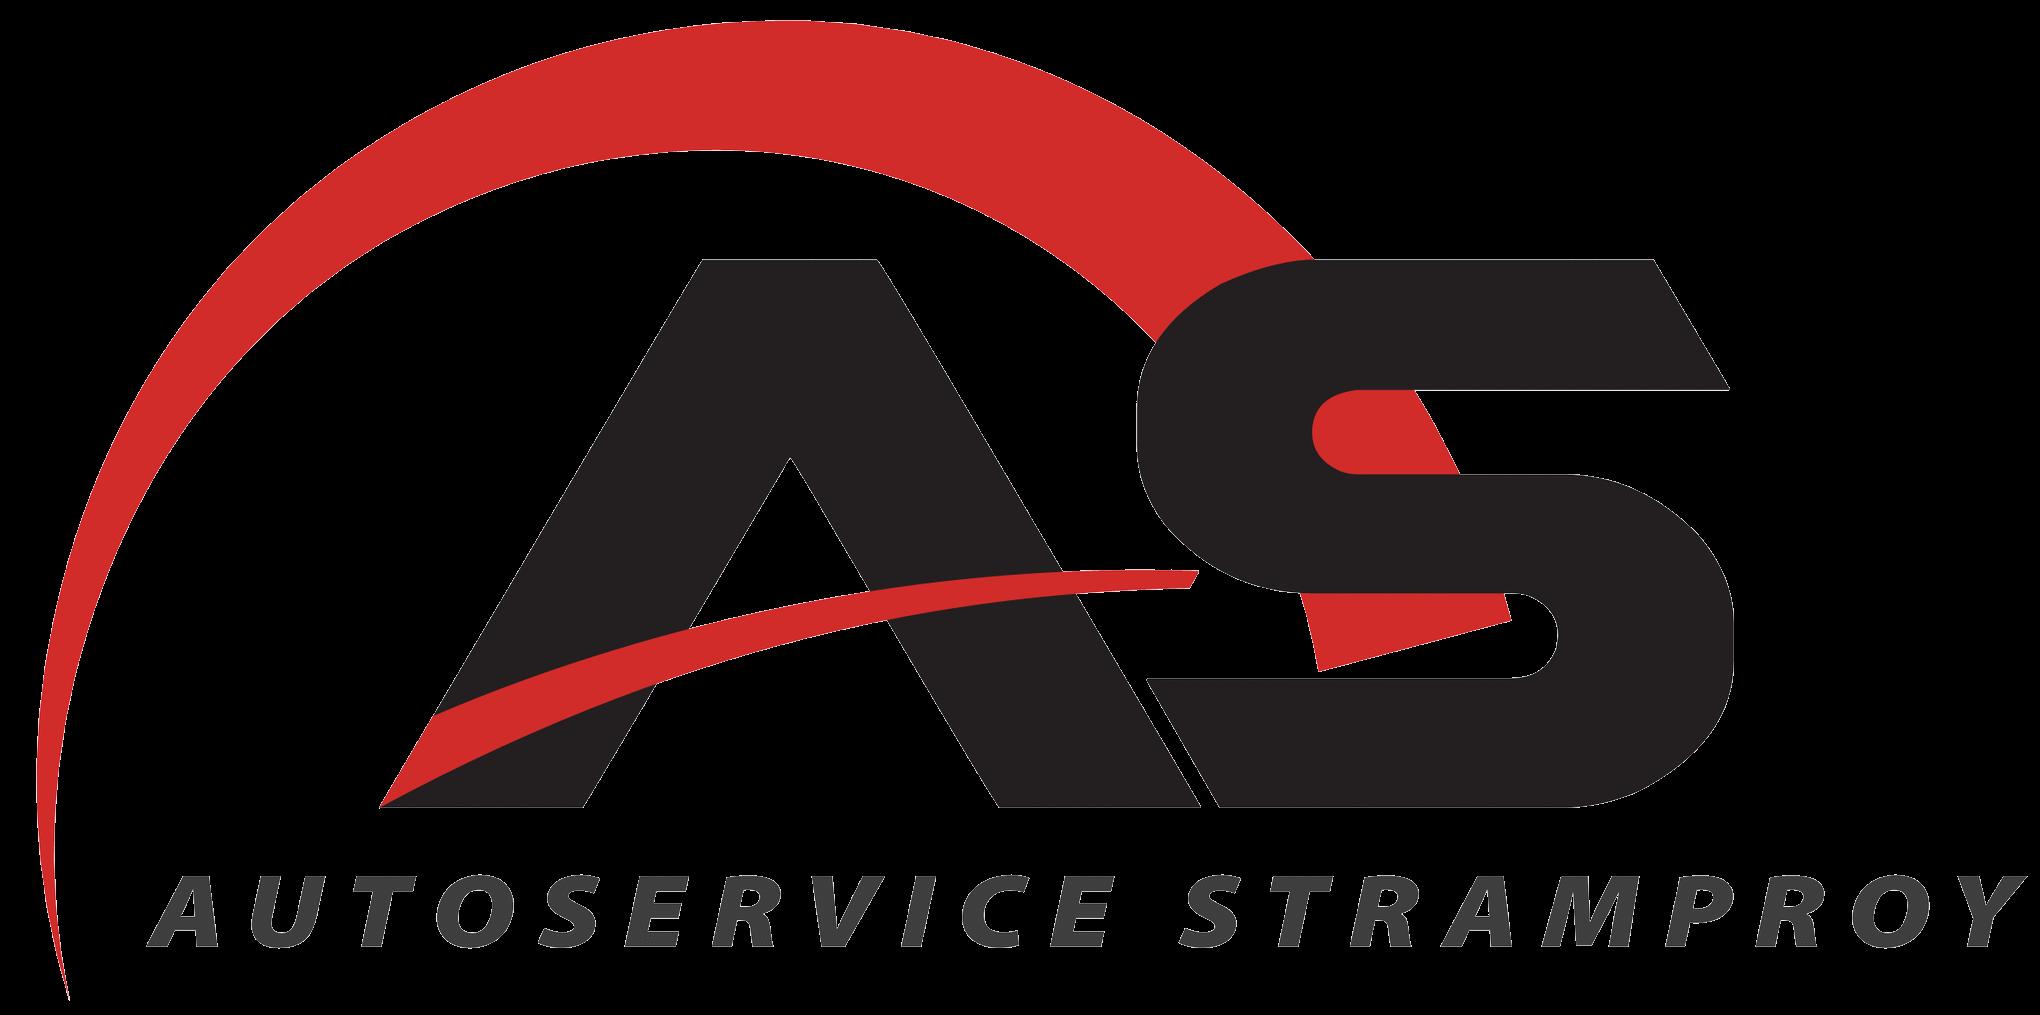 Autoservice Stramproy